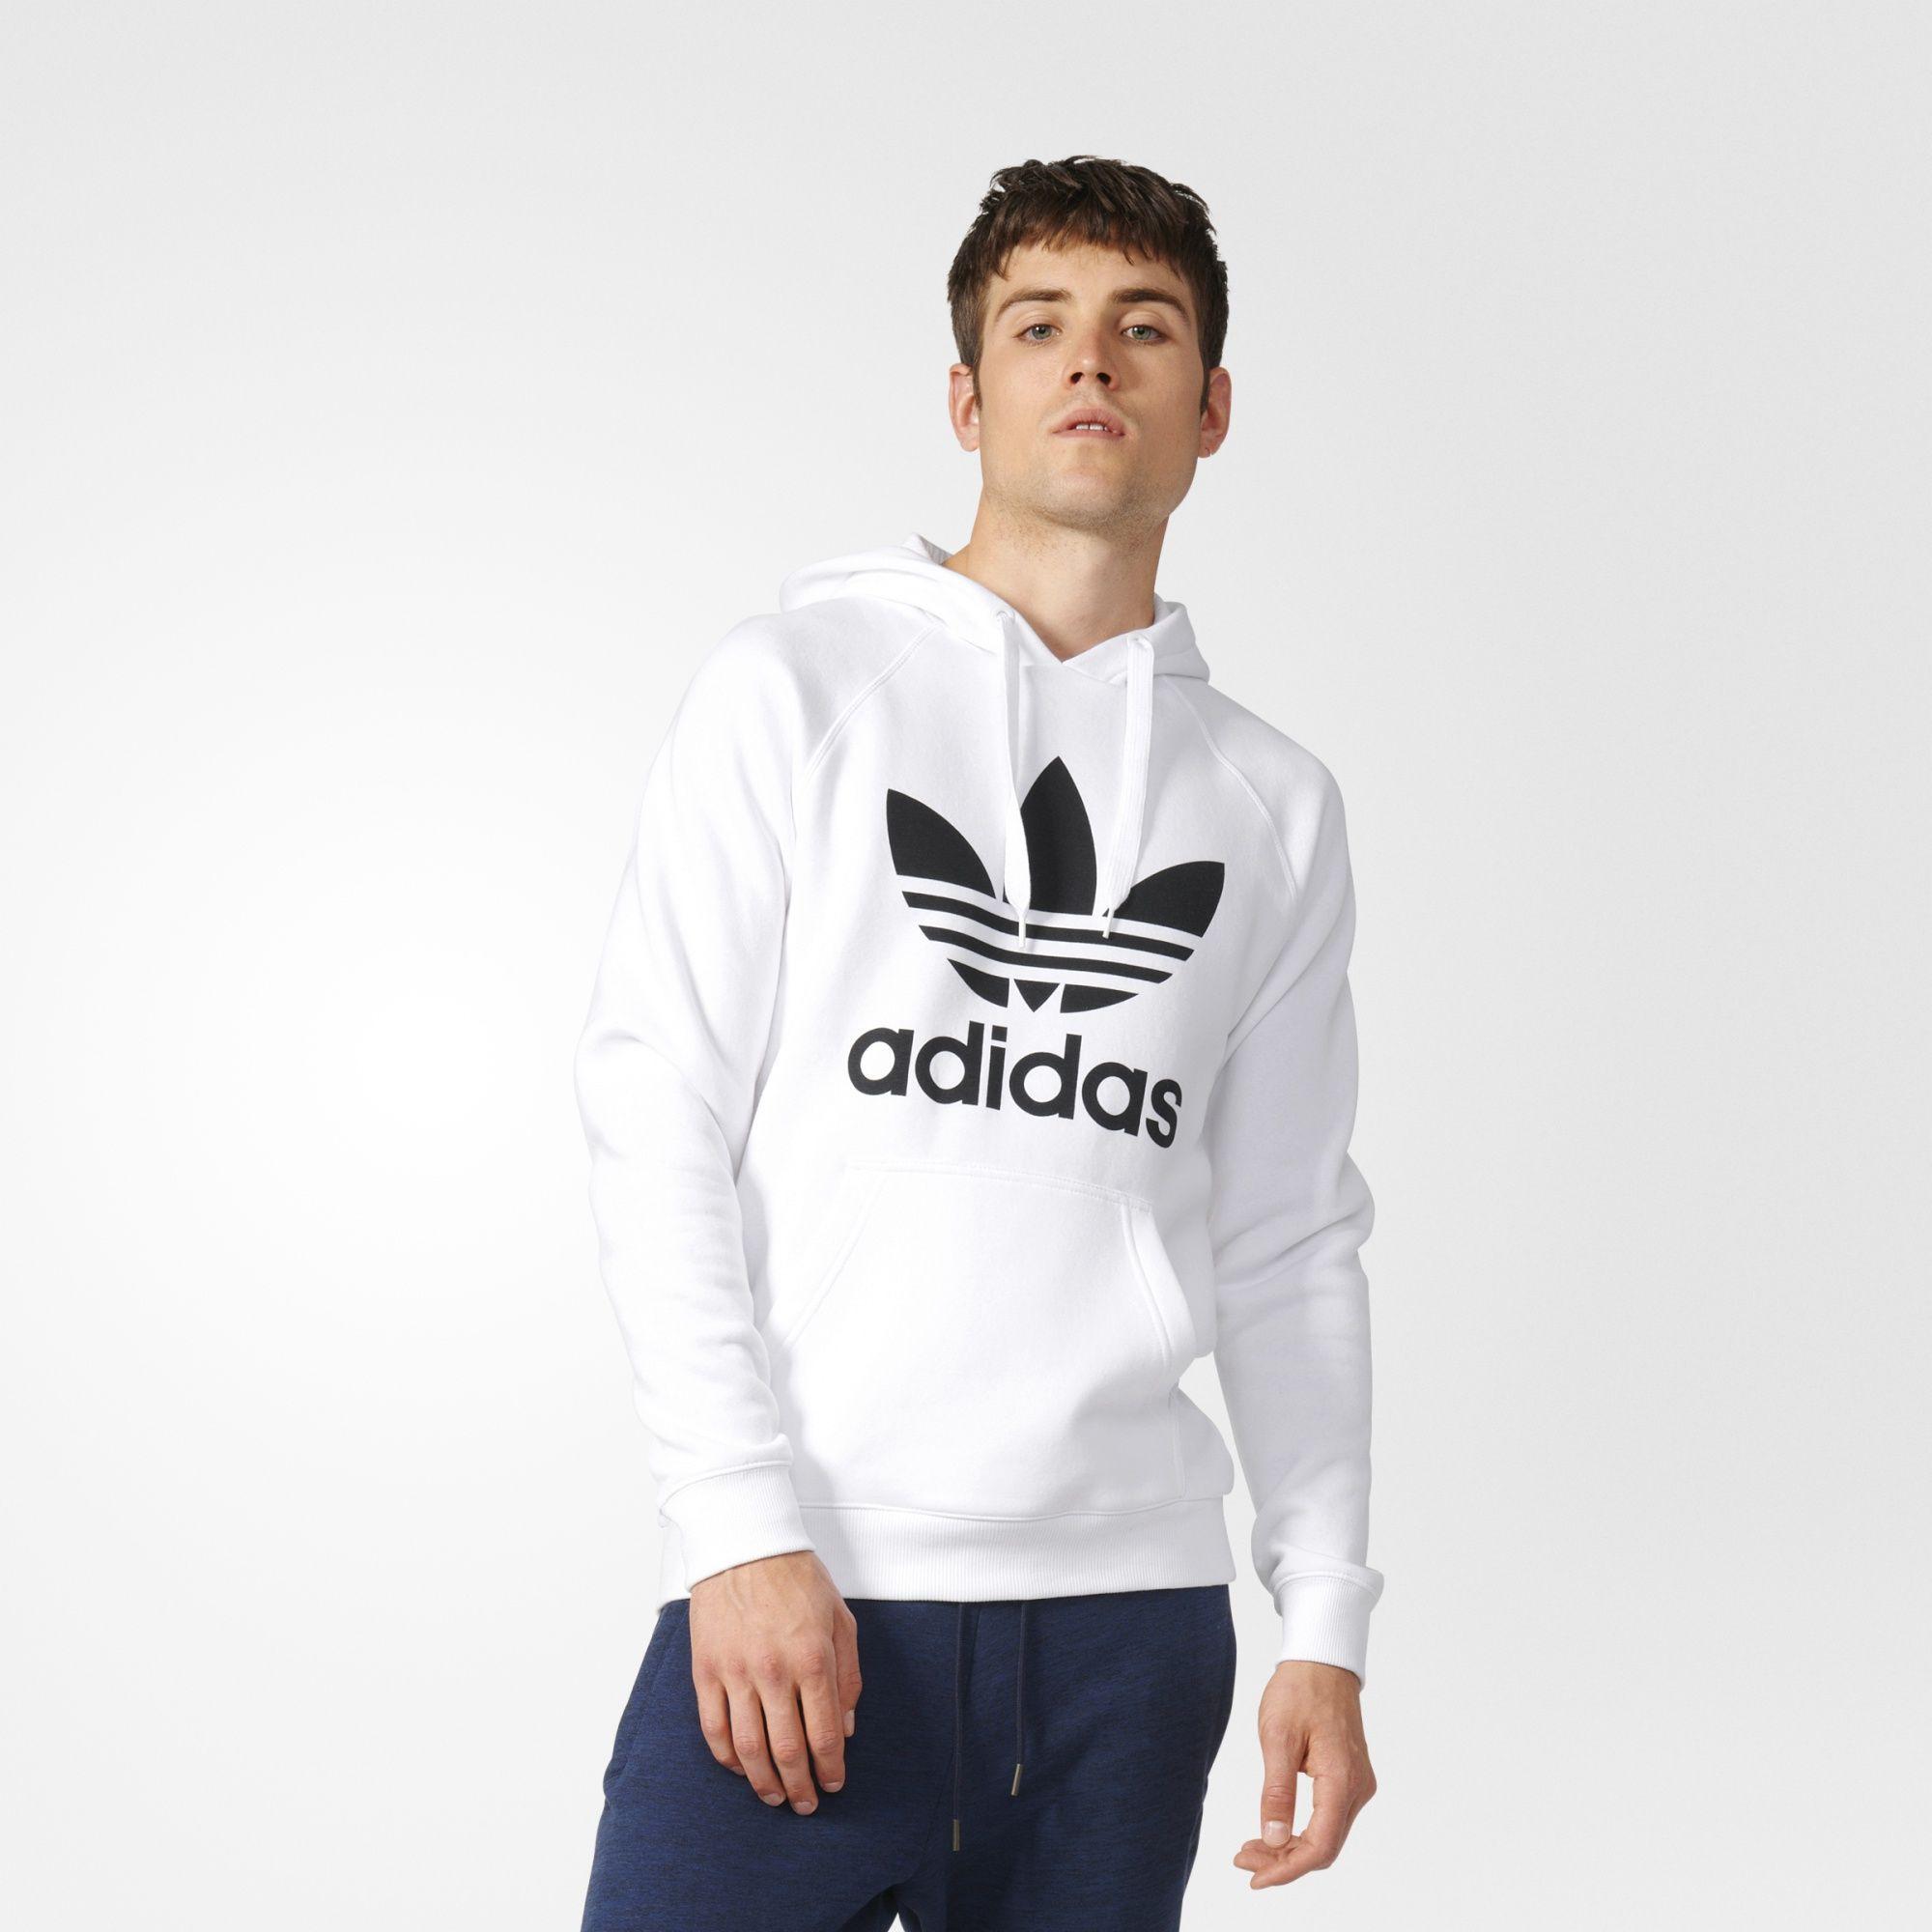 adidas originals white hoodie